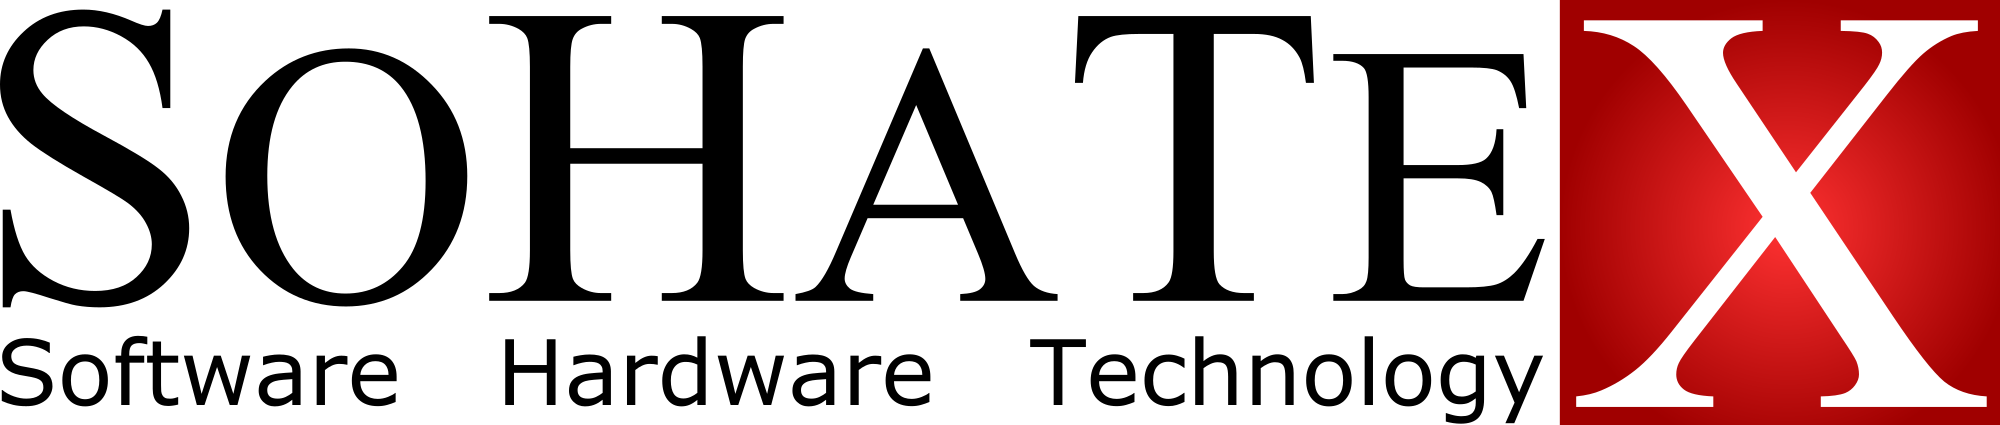 Sohatex GmbH